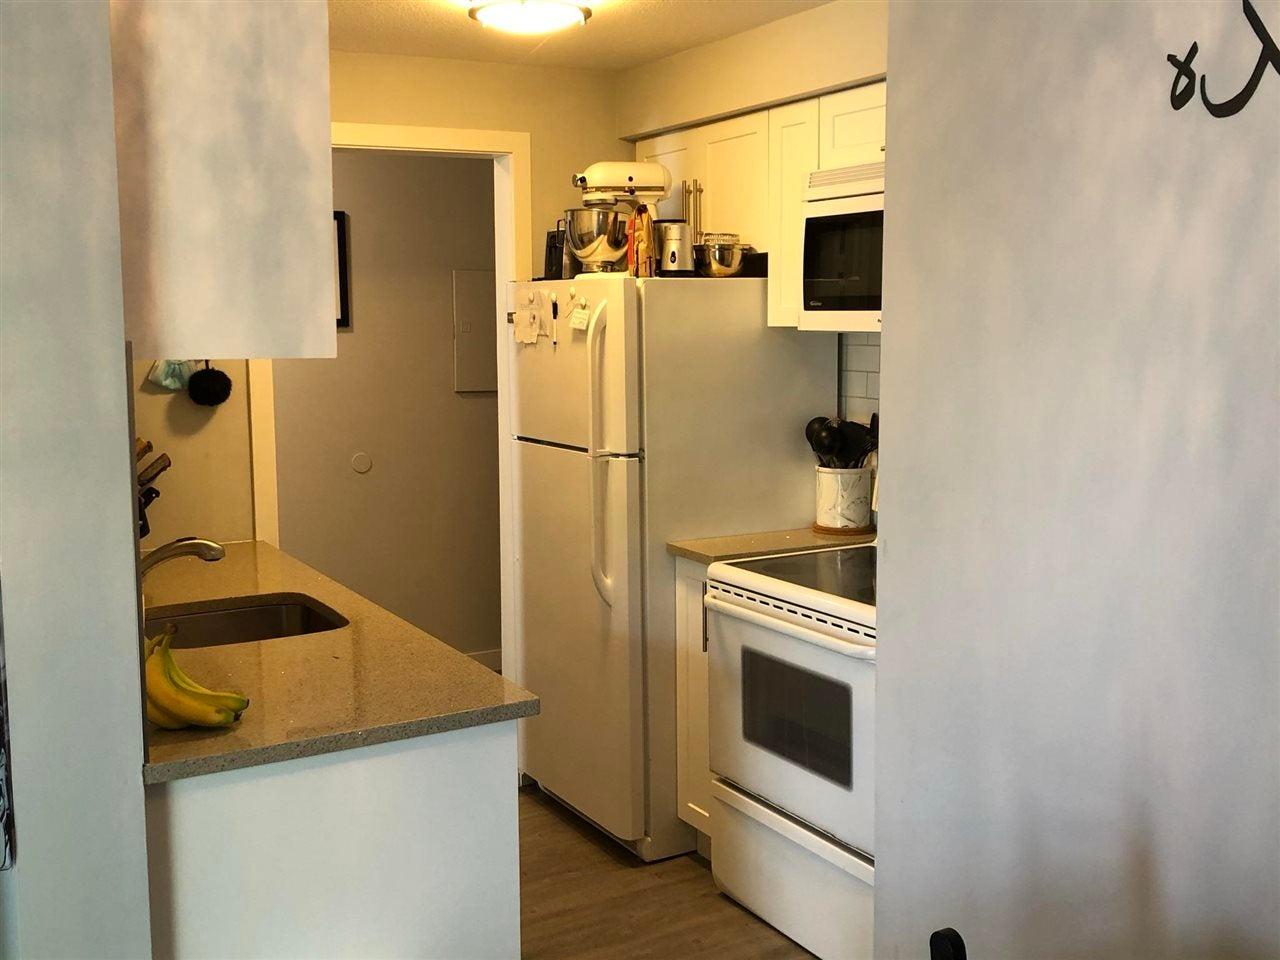 304 15238 100 AVENUE - Guildford Apartment/Condo for sale, 1 Bedroom (R2576105) - #8